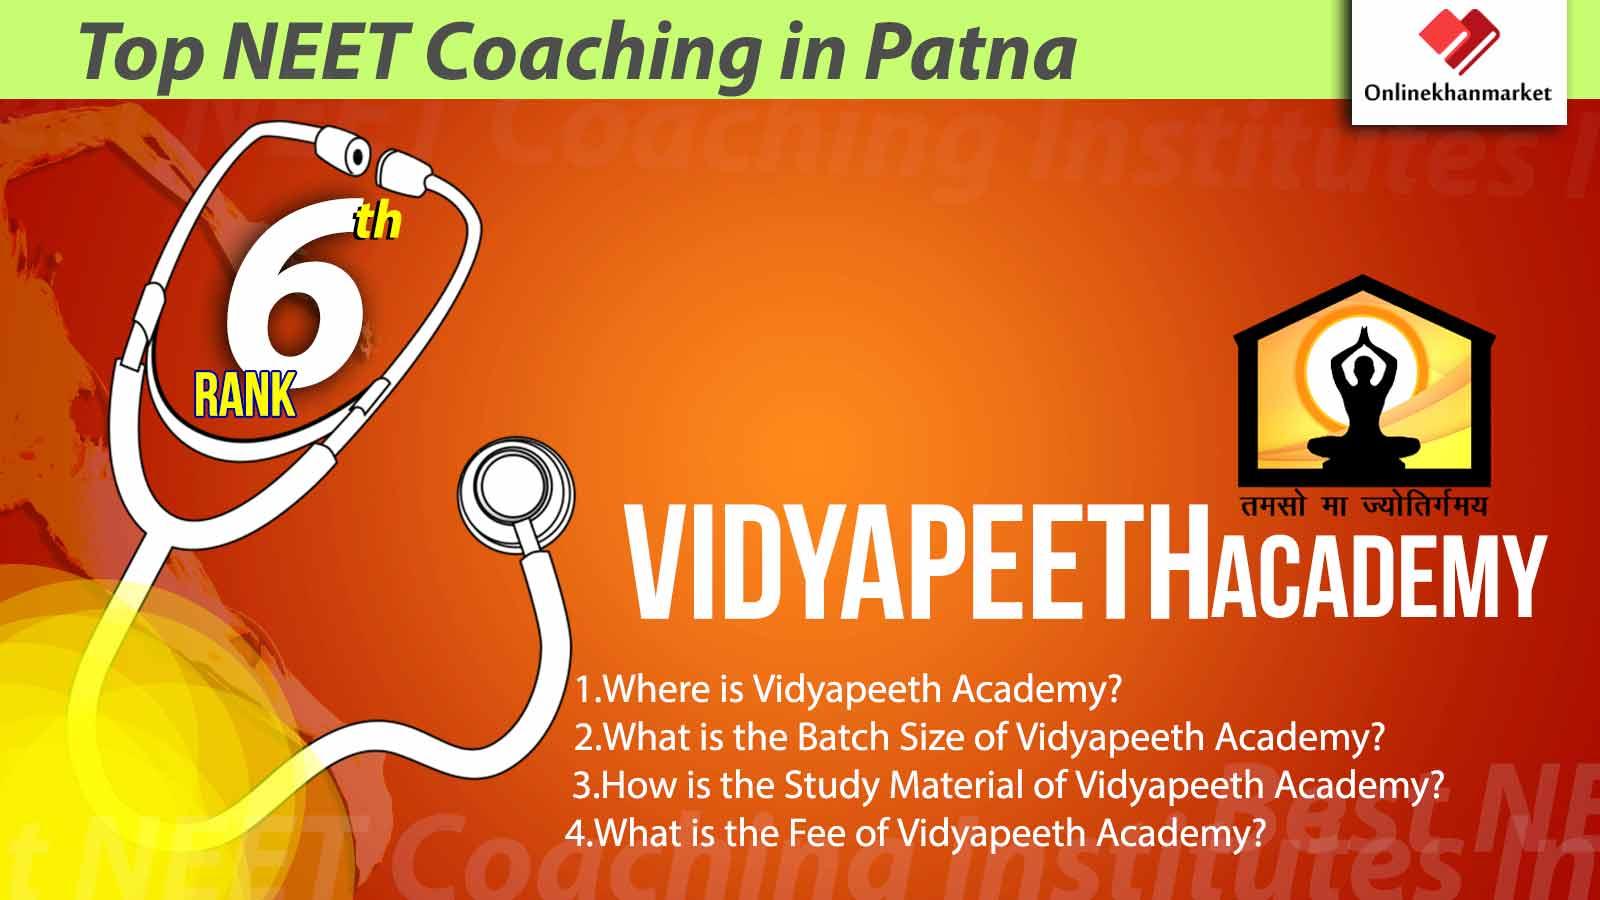 Best Neet Coaching in Patna